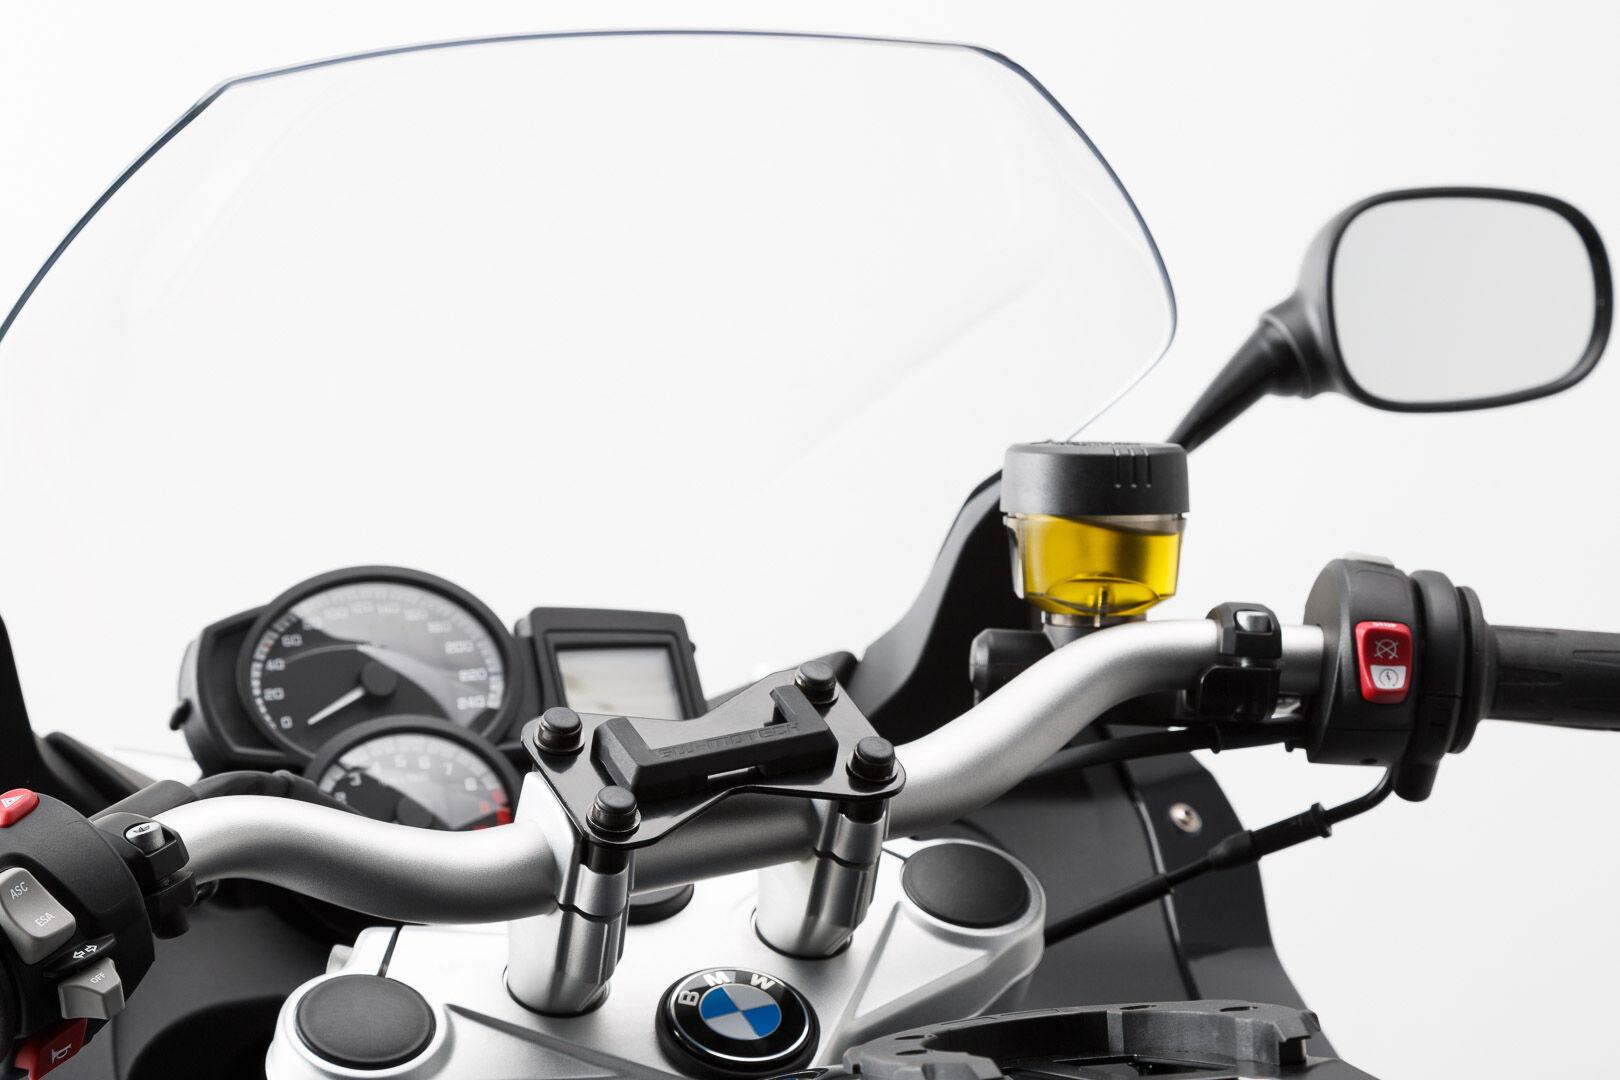 SW-Motech Supporto GPS  per manubrio - Nero. Assorbente d'urto.